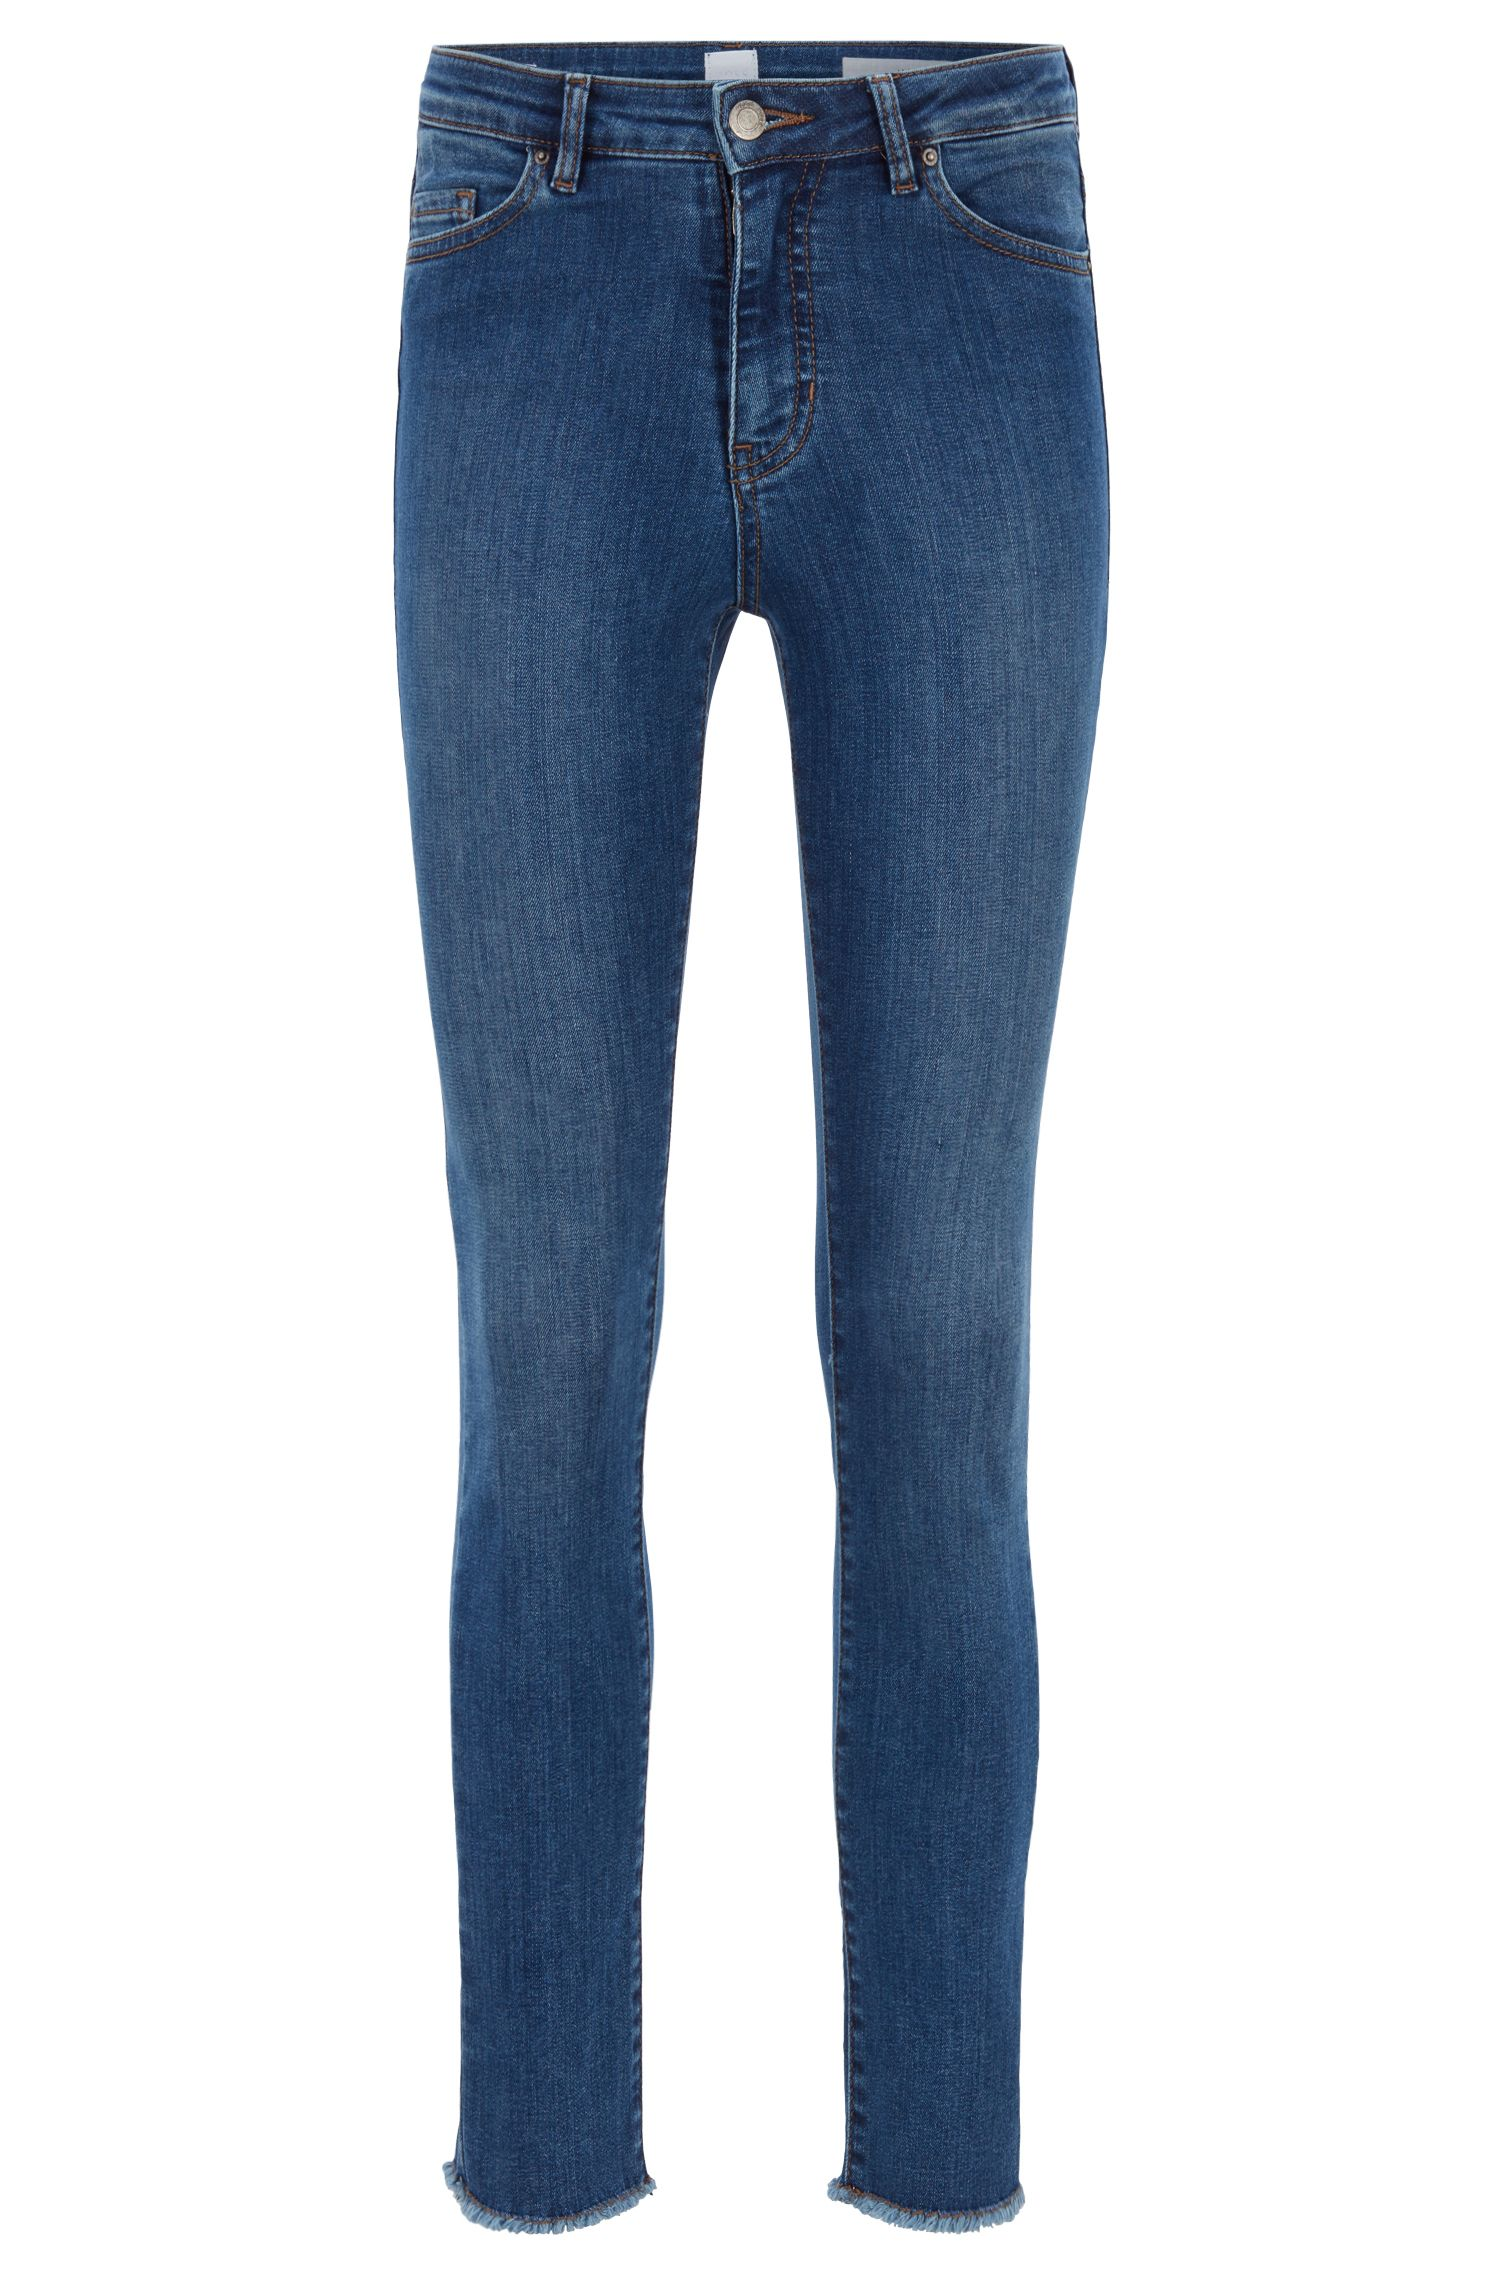 Jeans skinny fit alla caviglia in denim blu super-elasticizzato, Blu